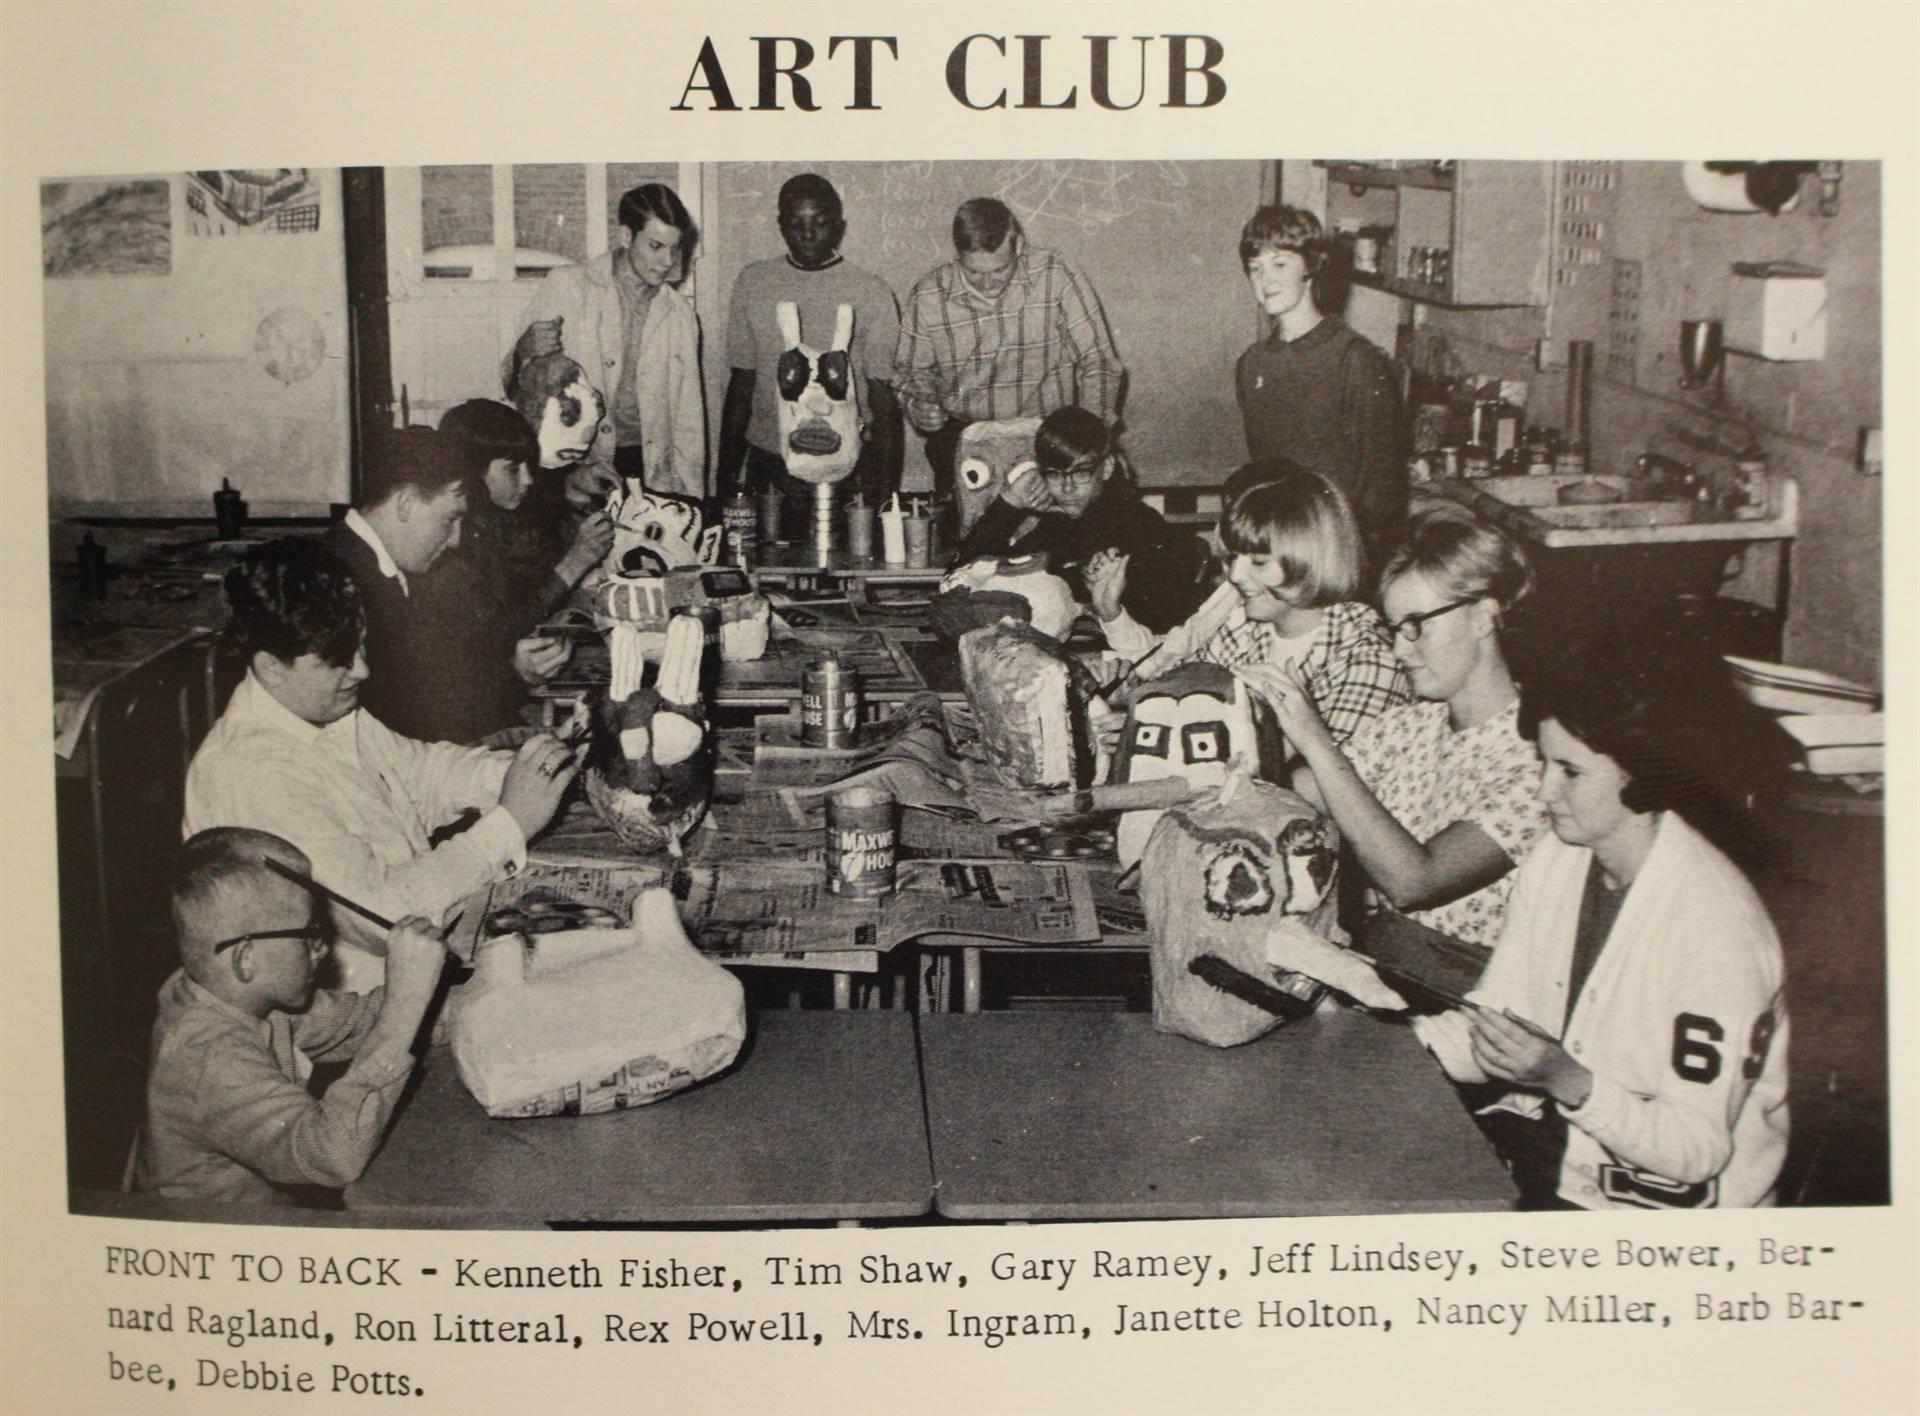 1969 Art Club